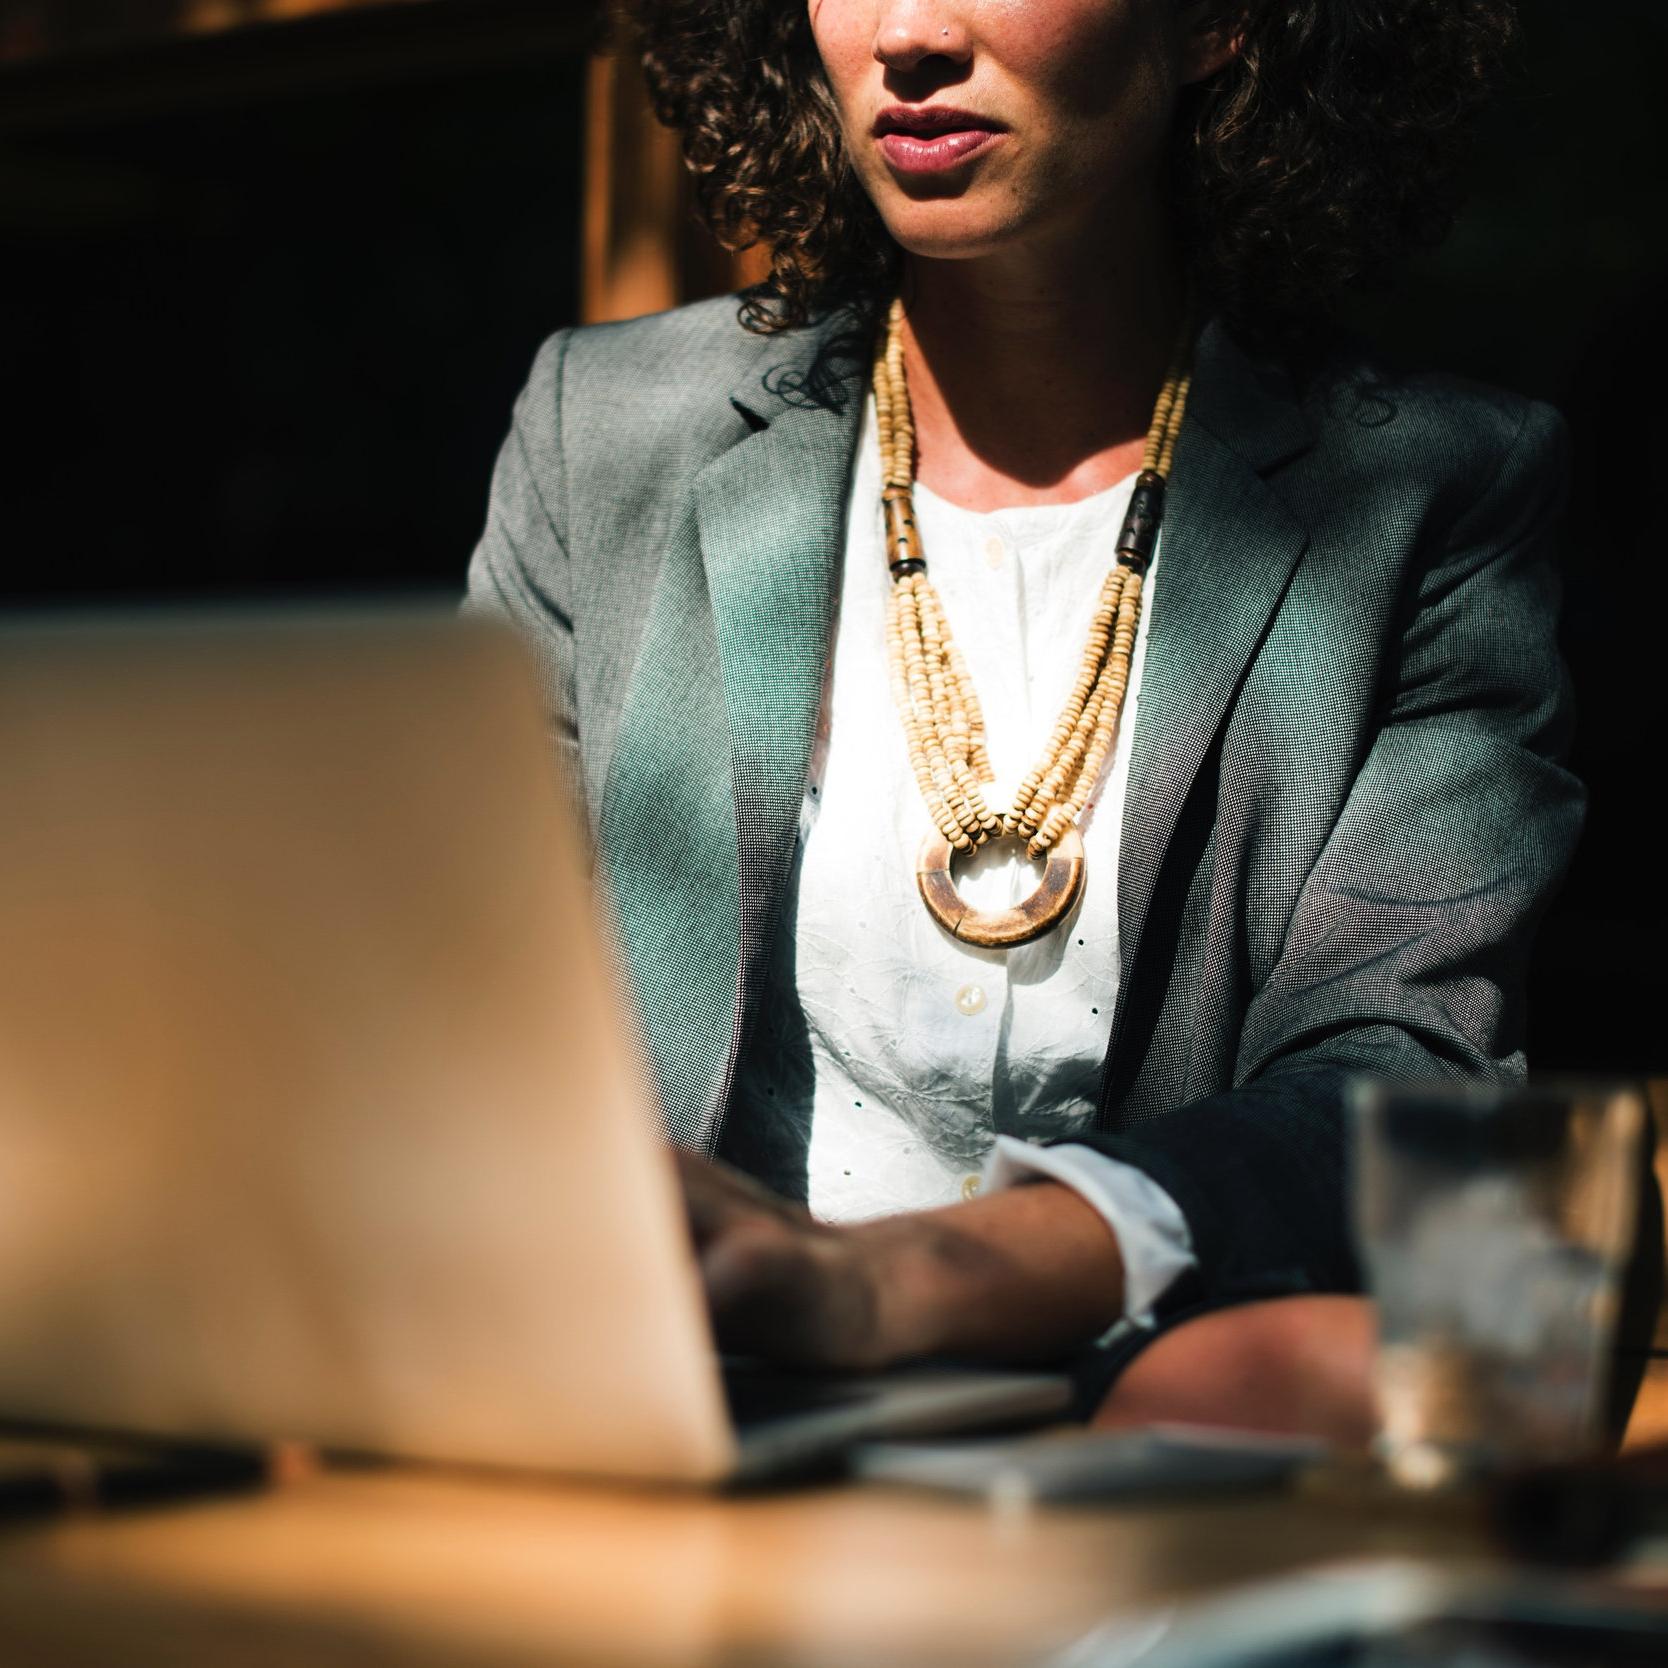 woman working on laptop via unsplash.com